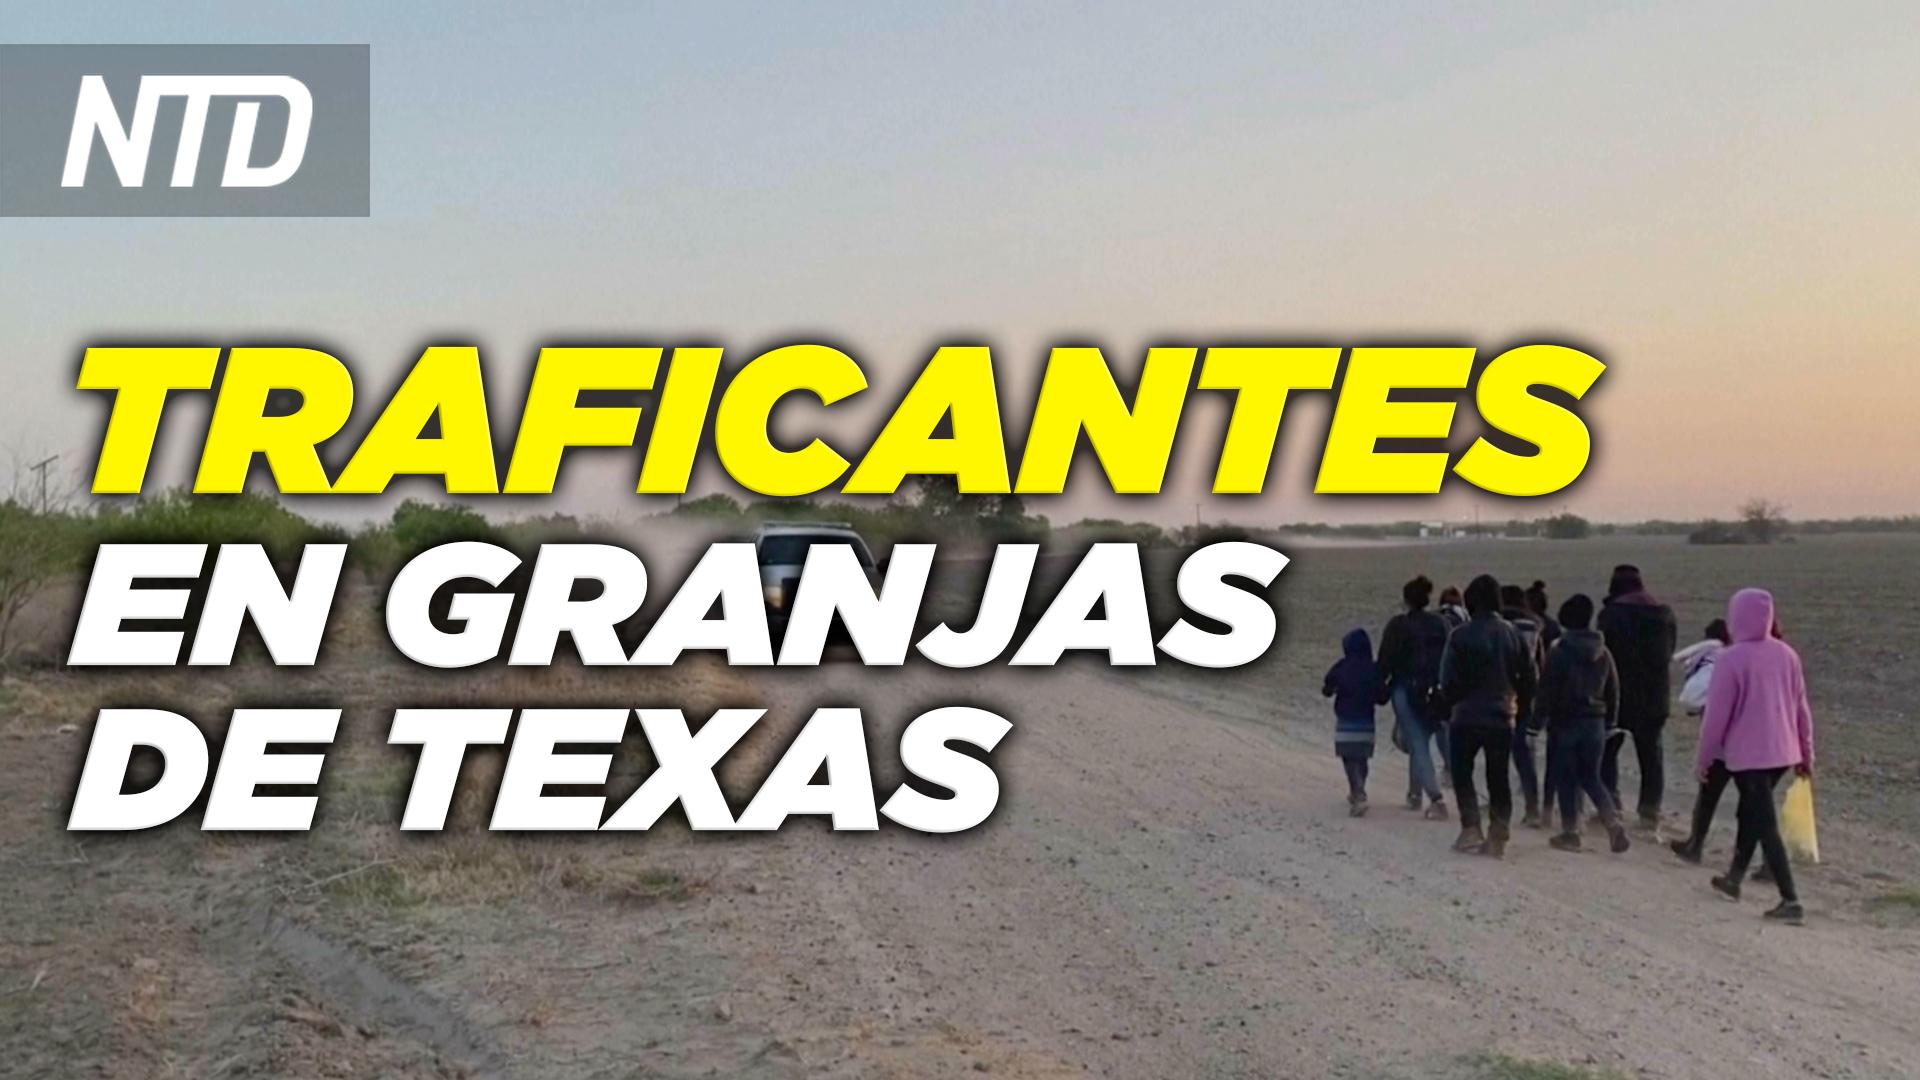 Texas está lidiando con traficantes; Identifican a tirador de Fedex | NTD